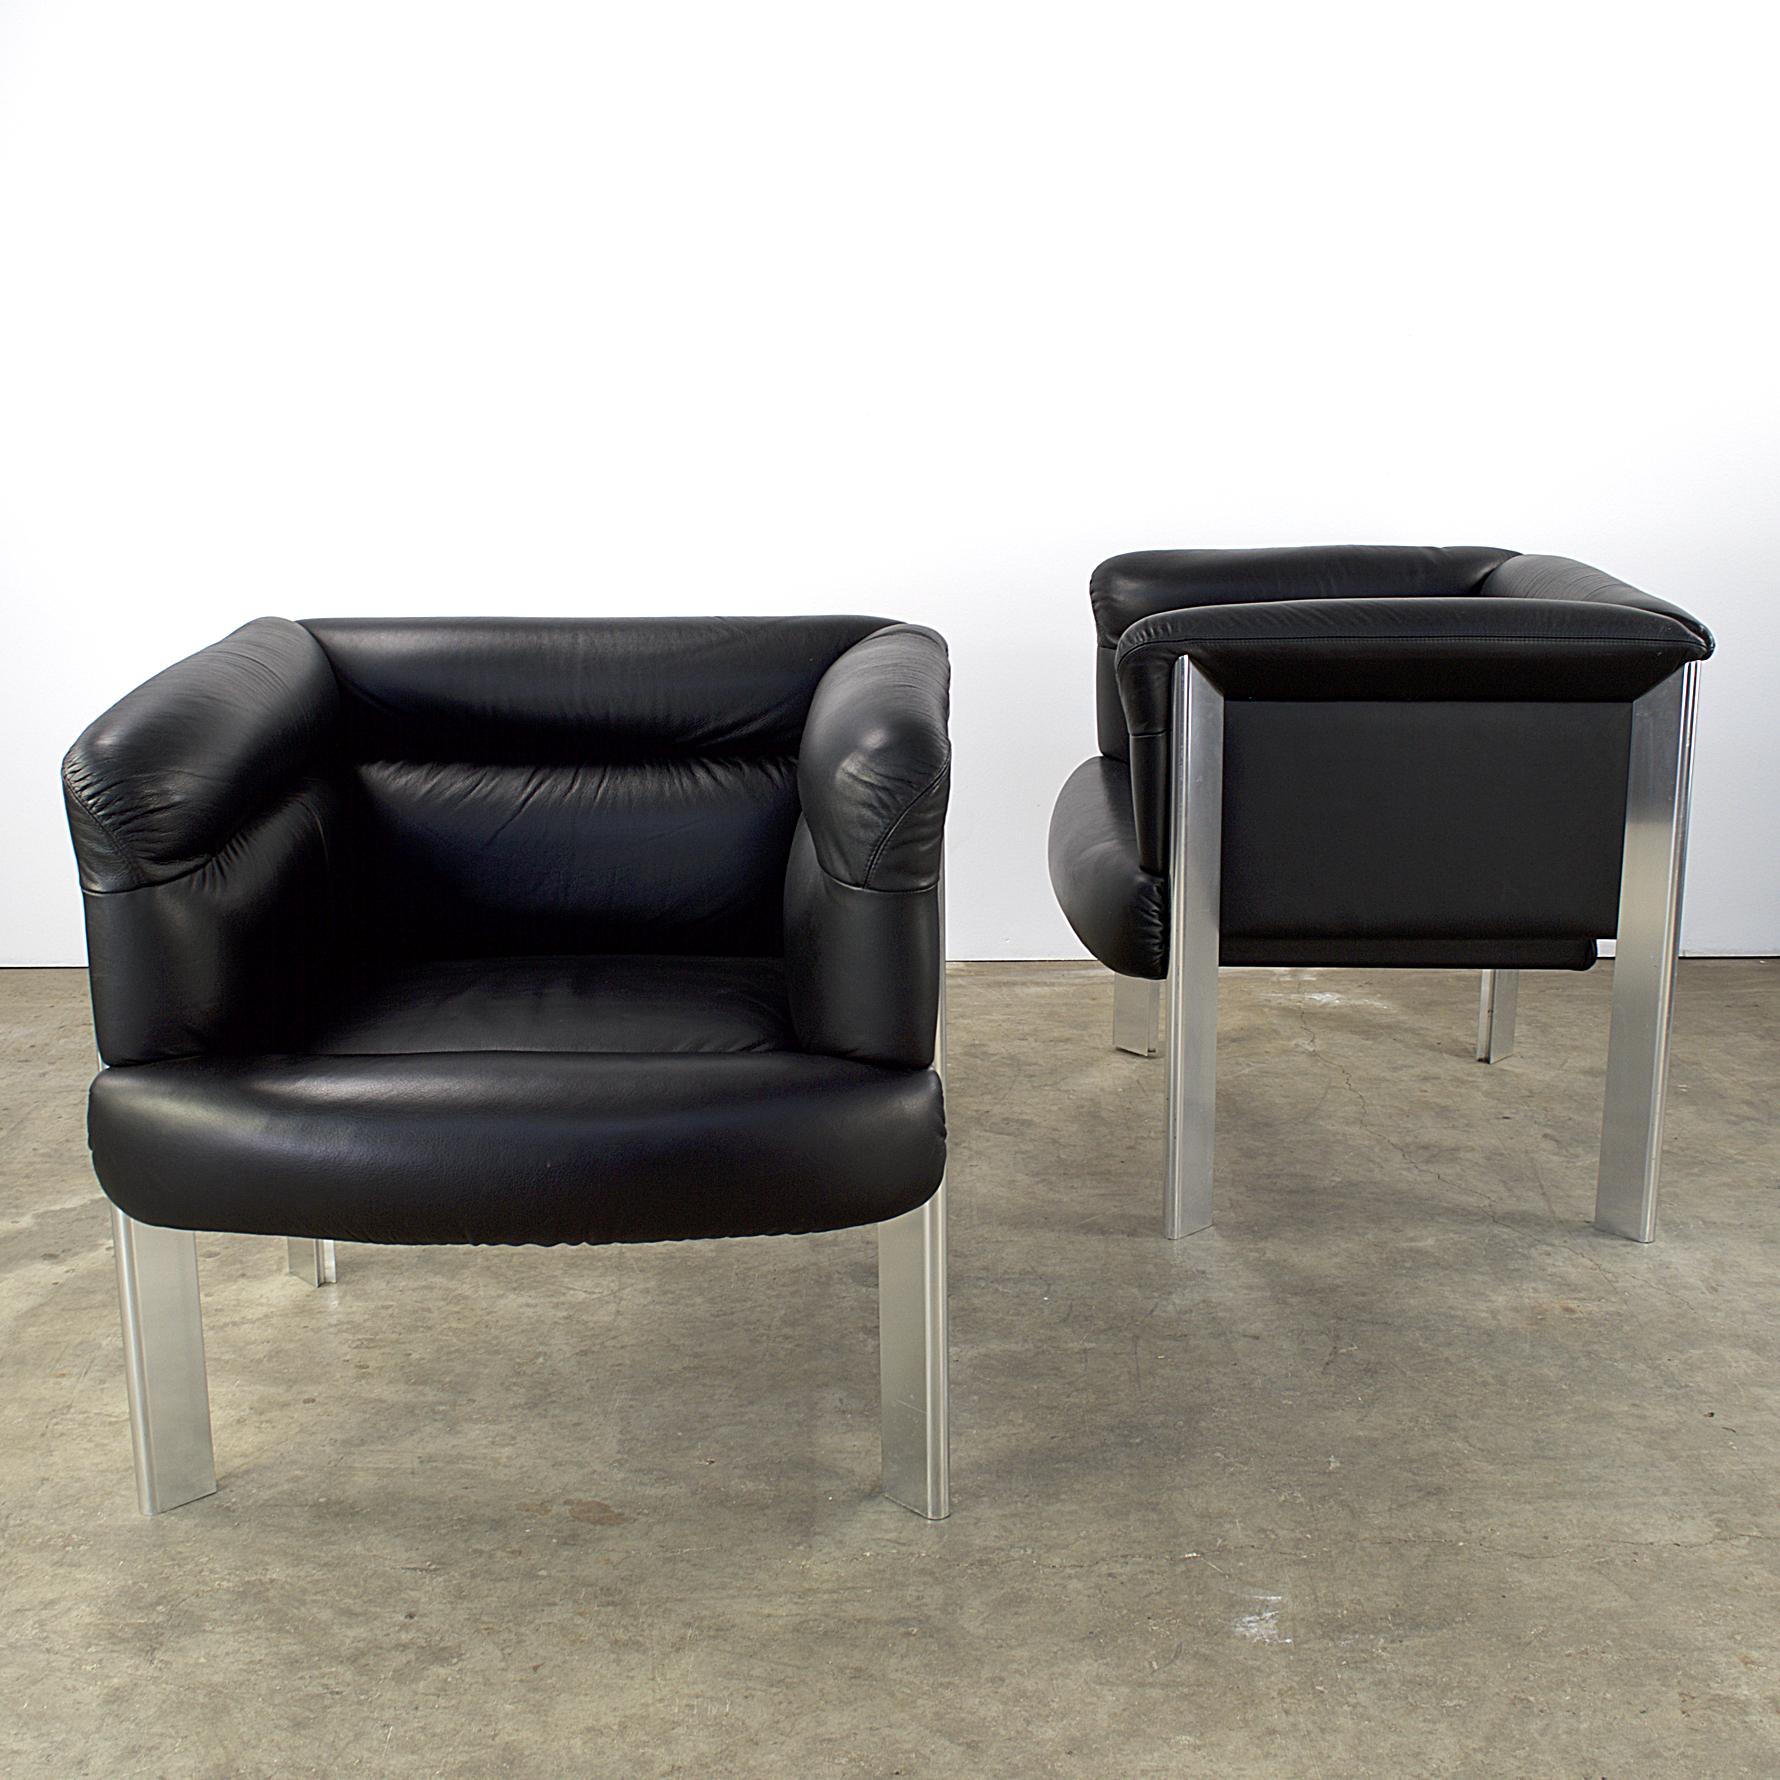 80\'s Poltrona Frau fauteuils model \'Interlude\' by Marco Zanuso ...